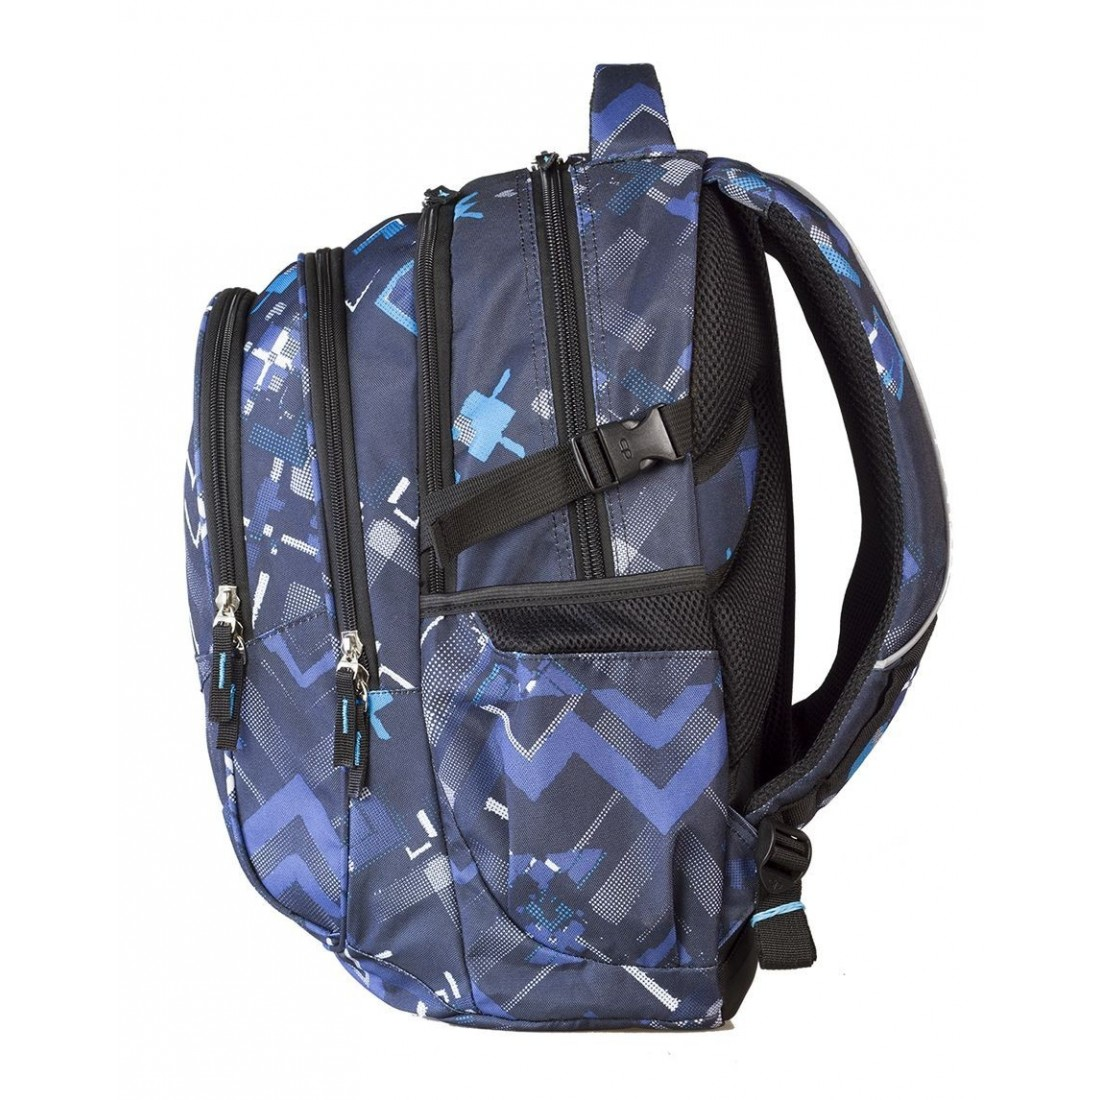 Plecak młodzieżowy CoolPack CP - 4 przegrody FACTOR DARTS 447 - plecak-tornister.pl